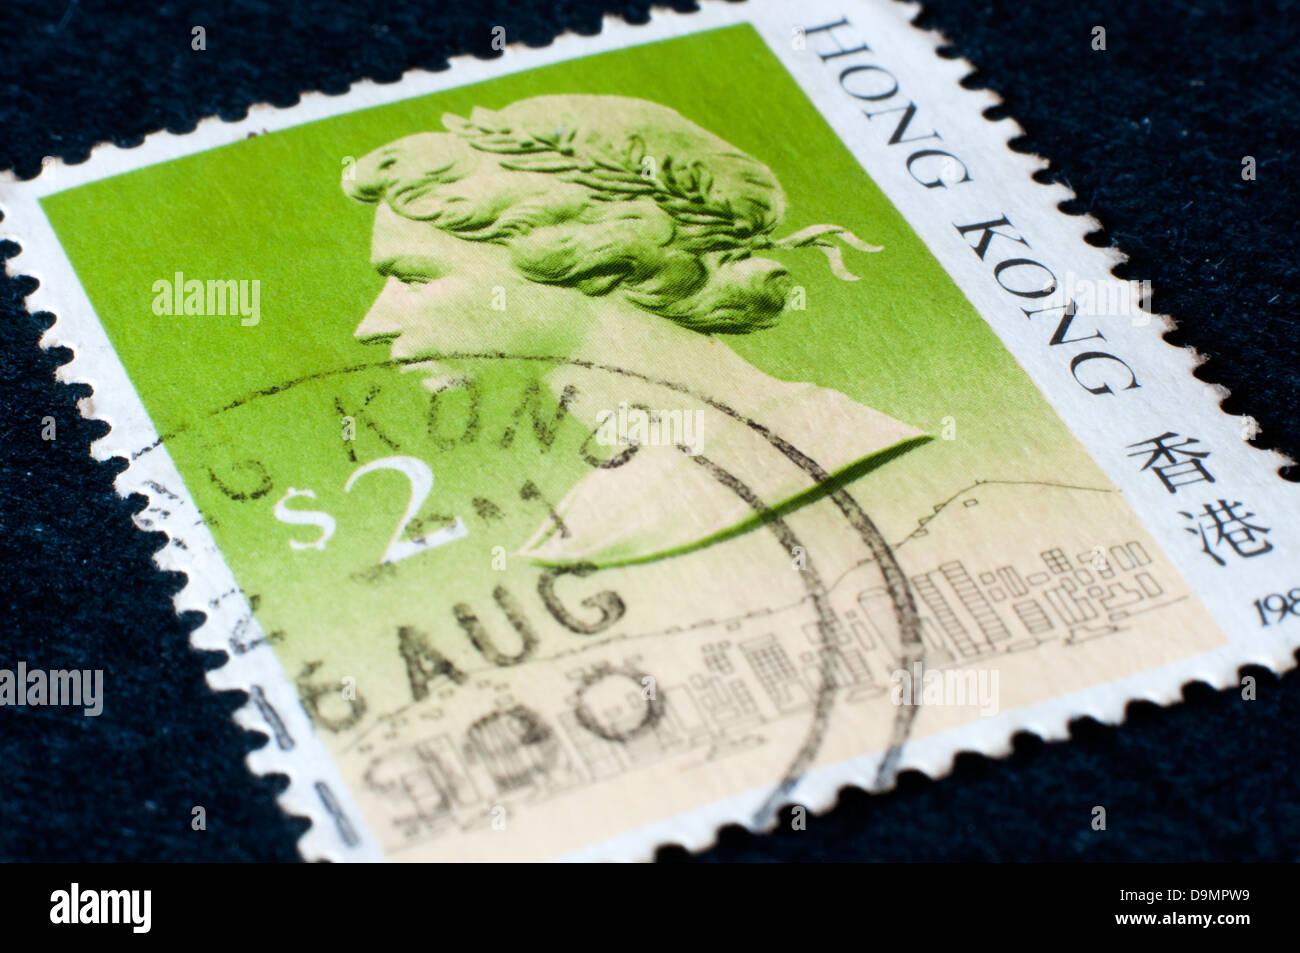 Hong Kong Postage Stamp Stock Photos & Hong Kong Postage